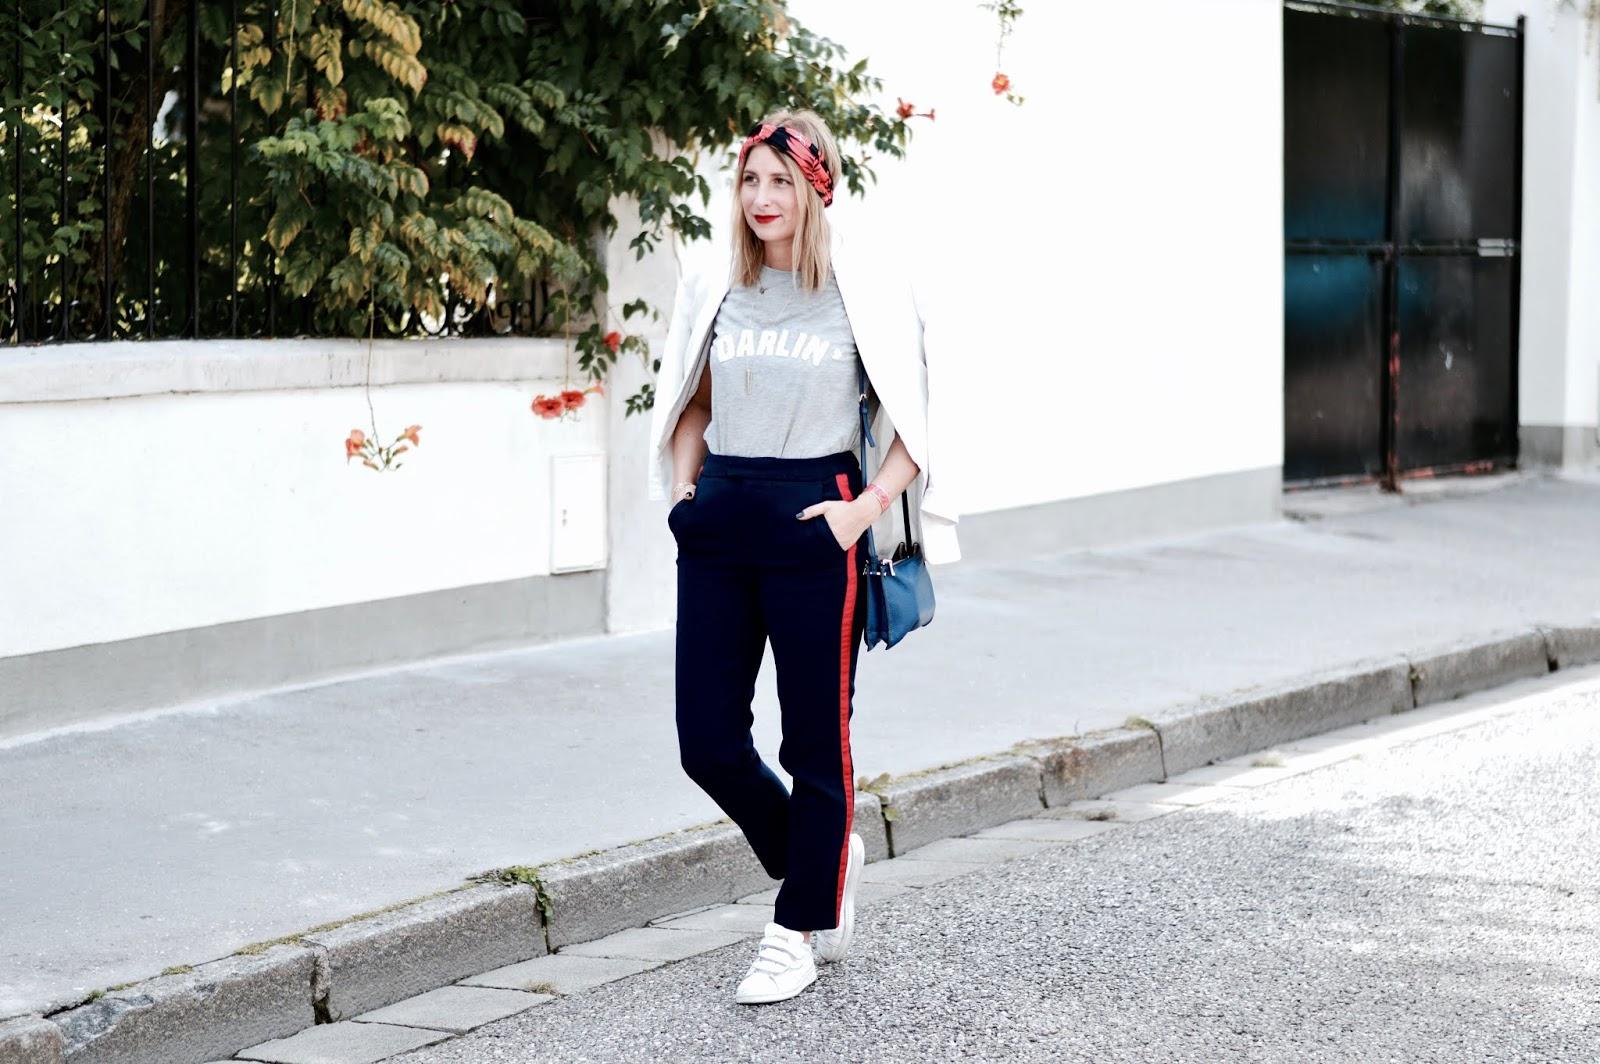 look automne : look féminin / masculin - teeshirt message - pantalon jogging - veste costard - basket blanche - headband